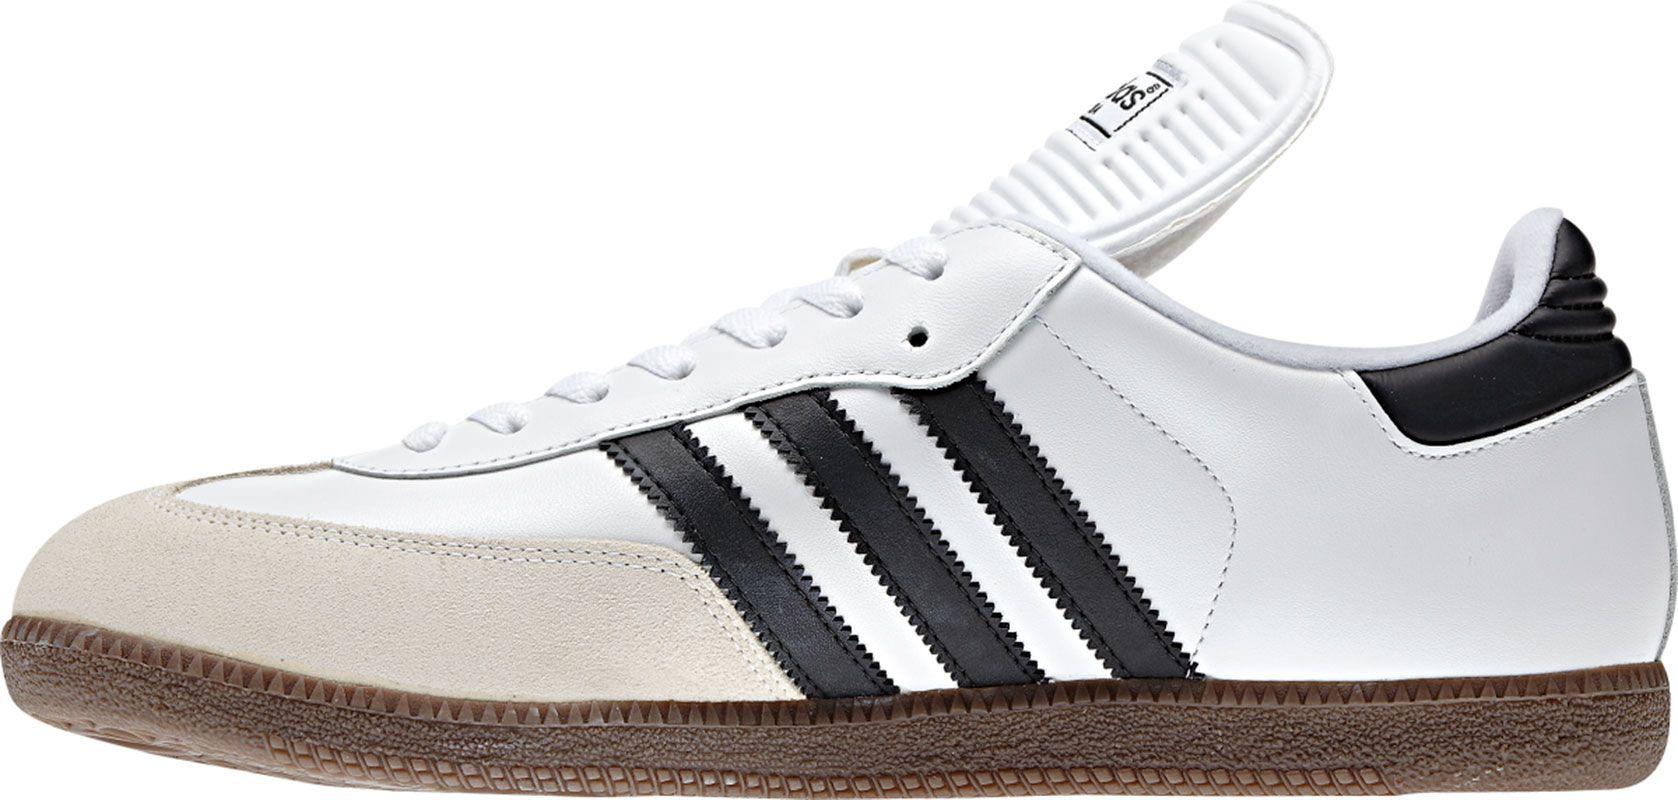 adidas classic shoes noimagefound ??? VJEJFPG